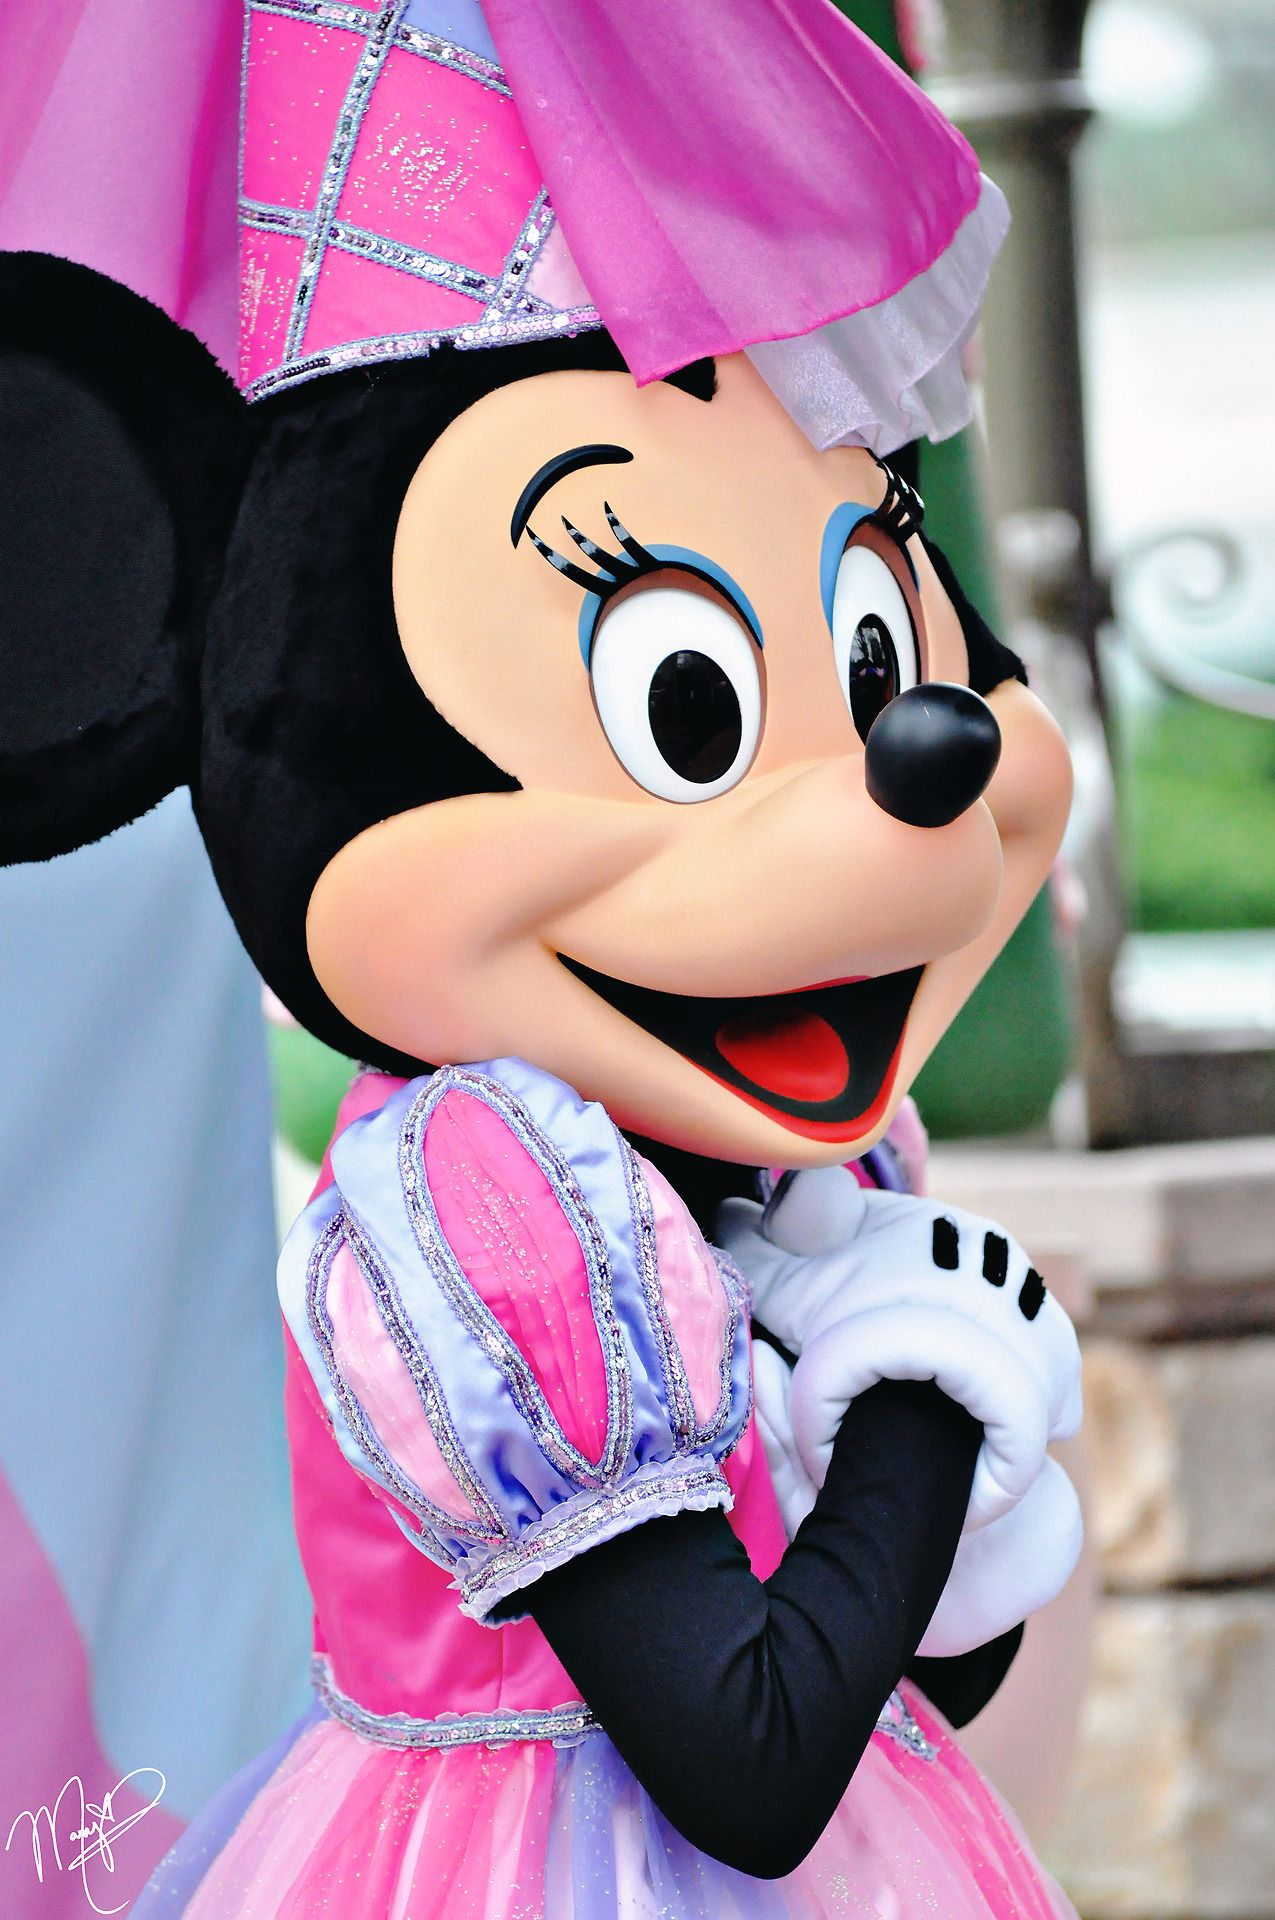 Princess minnie mouse disney disney disney mickey disney cast - Princesse minnie ...